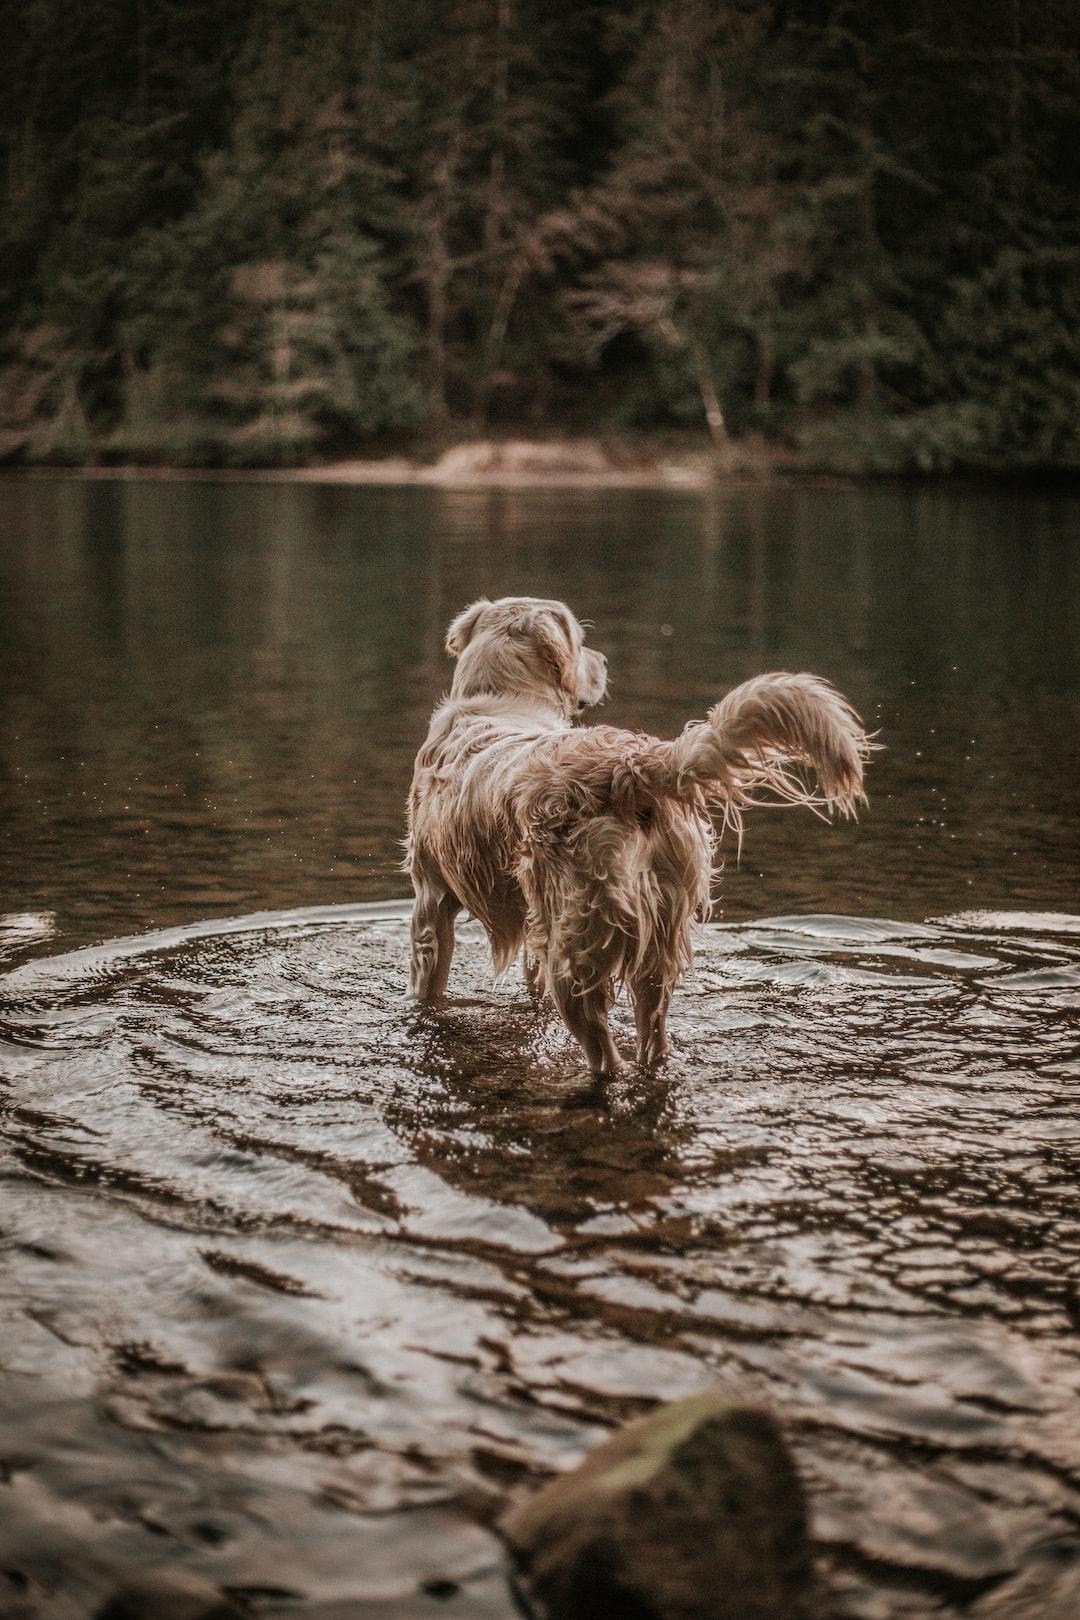 Cooper in the Wild